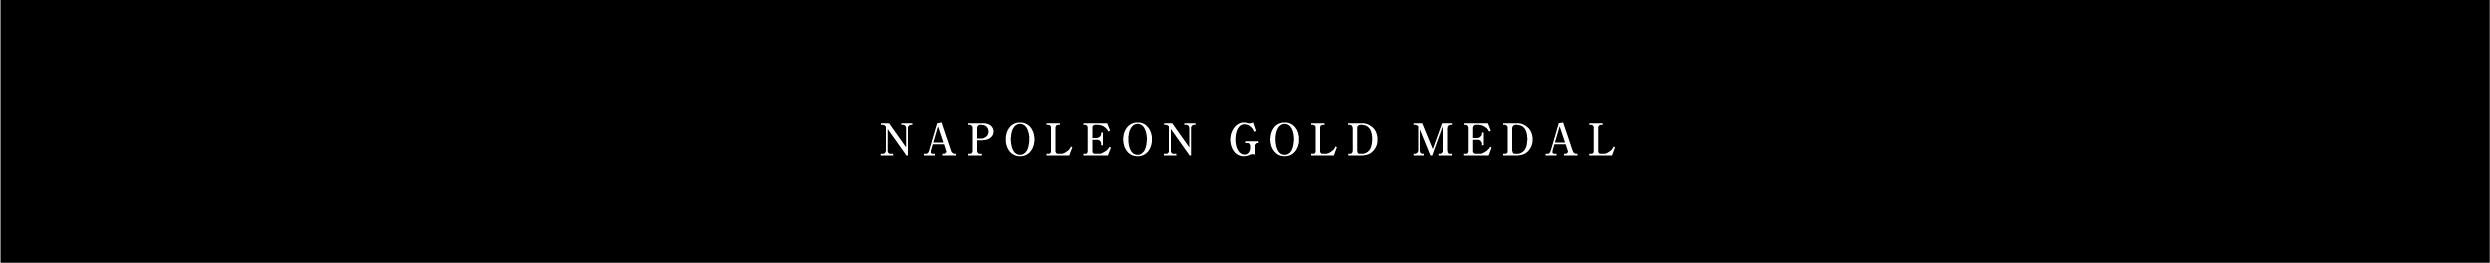 NAPOLEON GOLD MEDAL